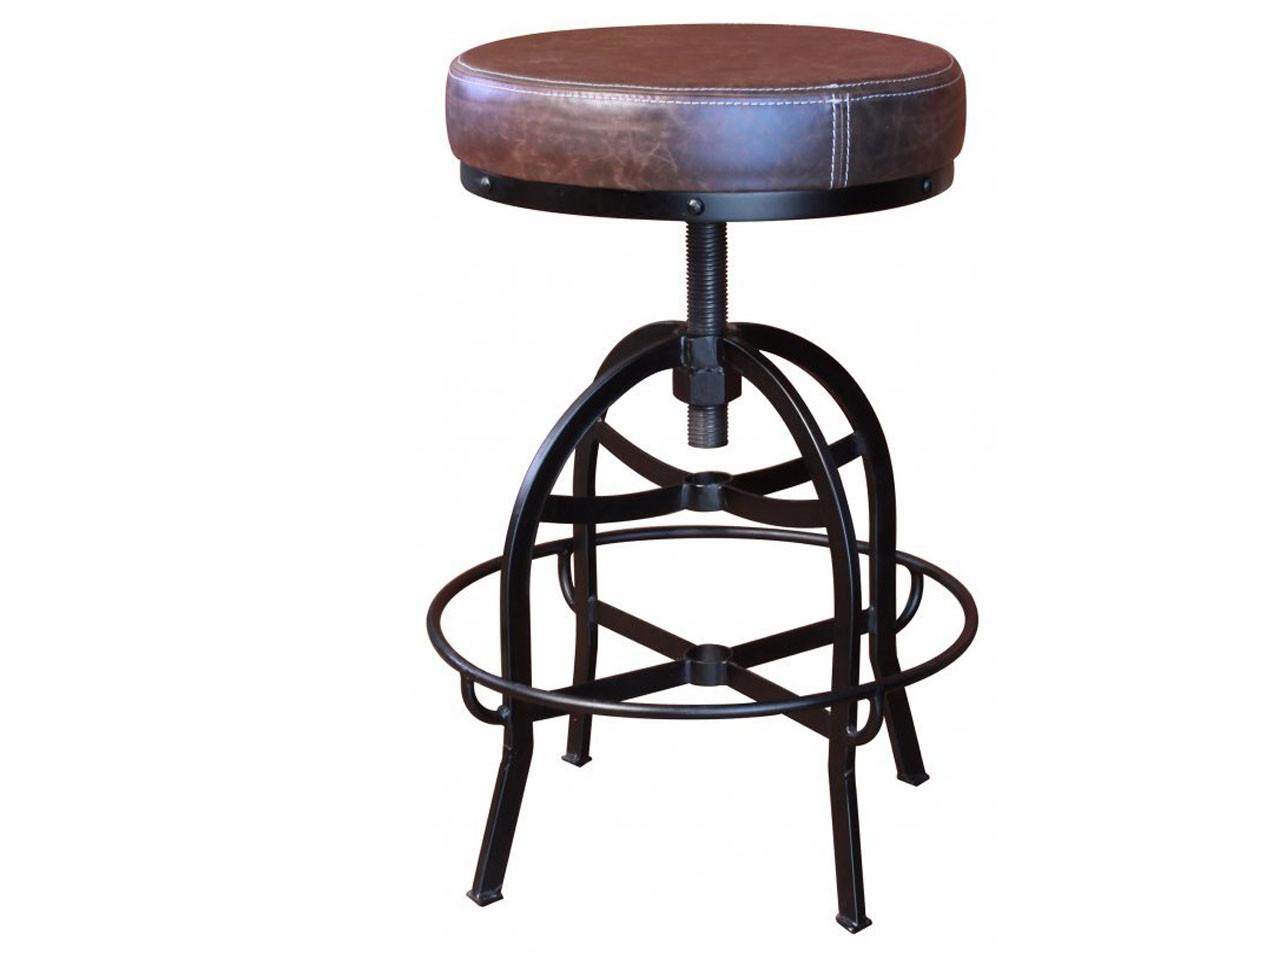 Pleasant Metal Adjustable Swivel Barstool Theyellowbook Wood Chair Design Ideas Theyellowbookinfo